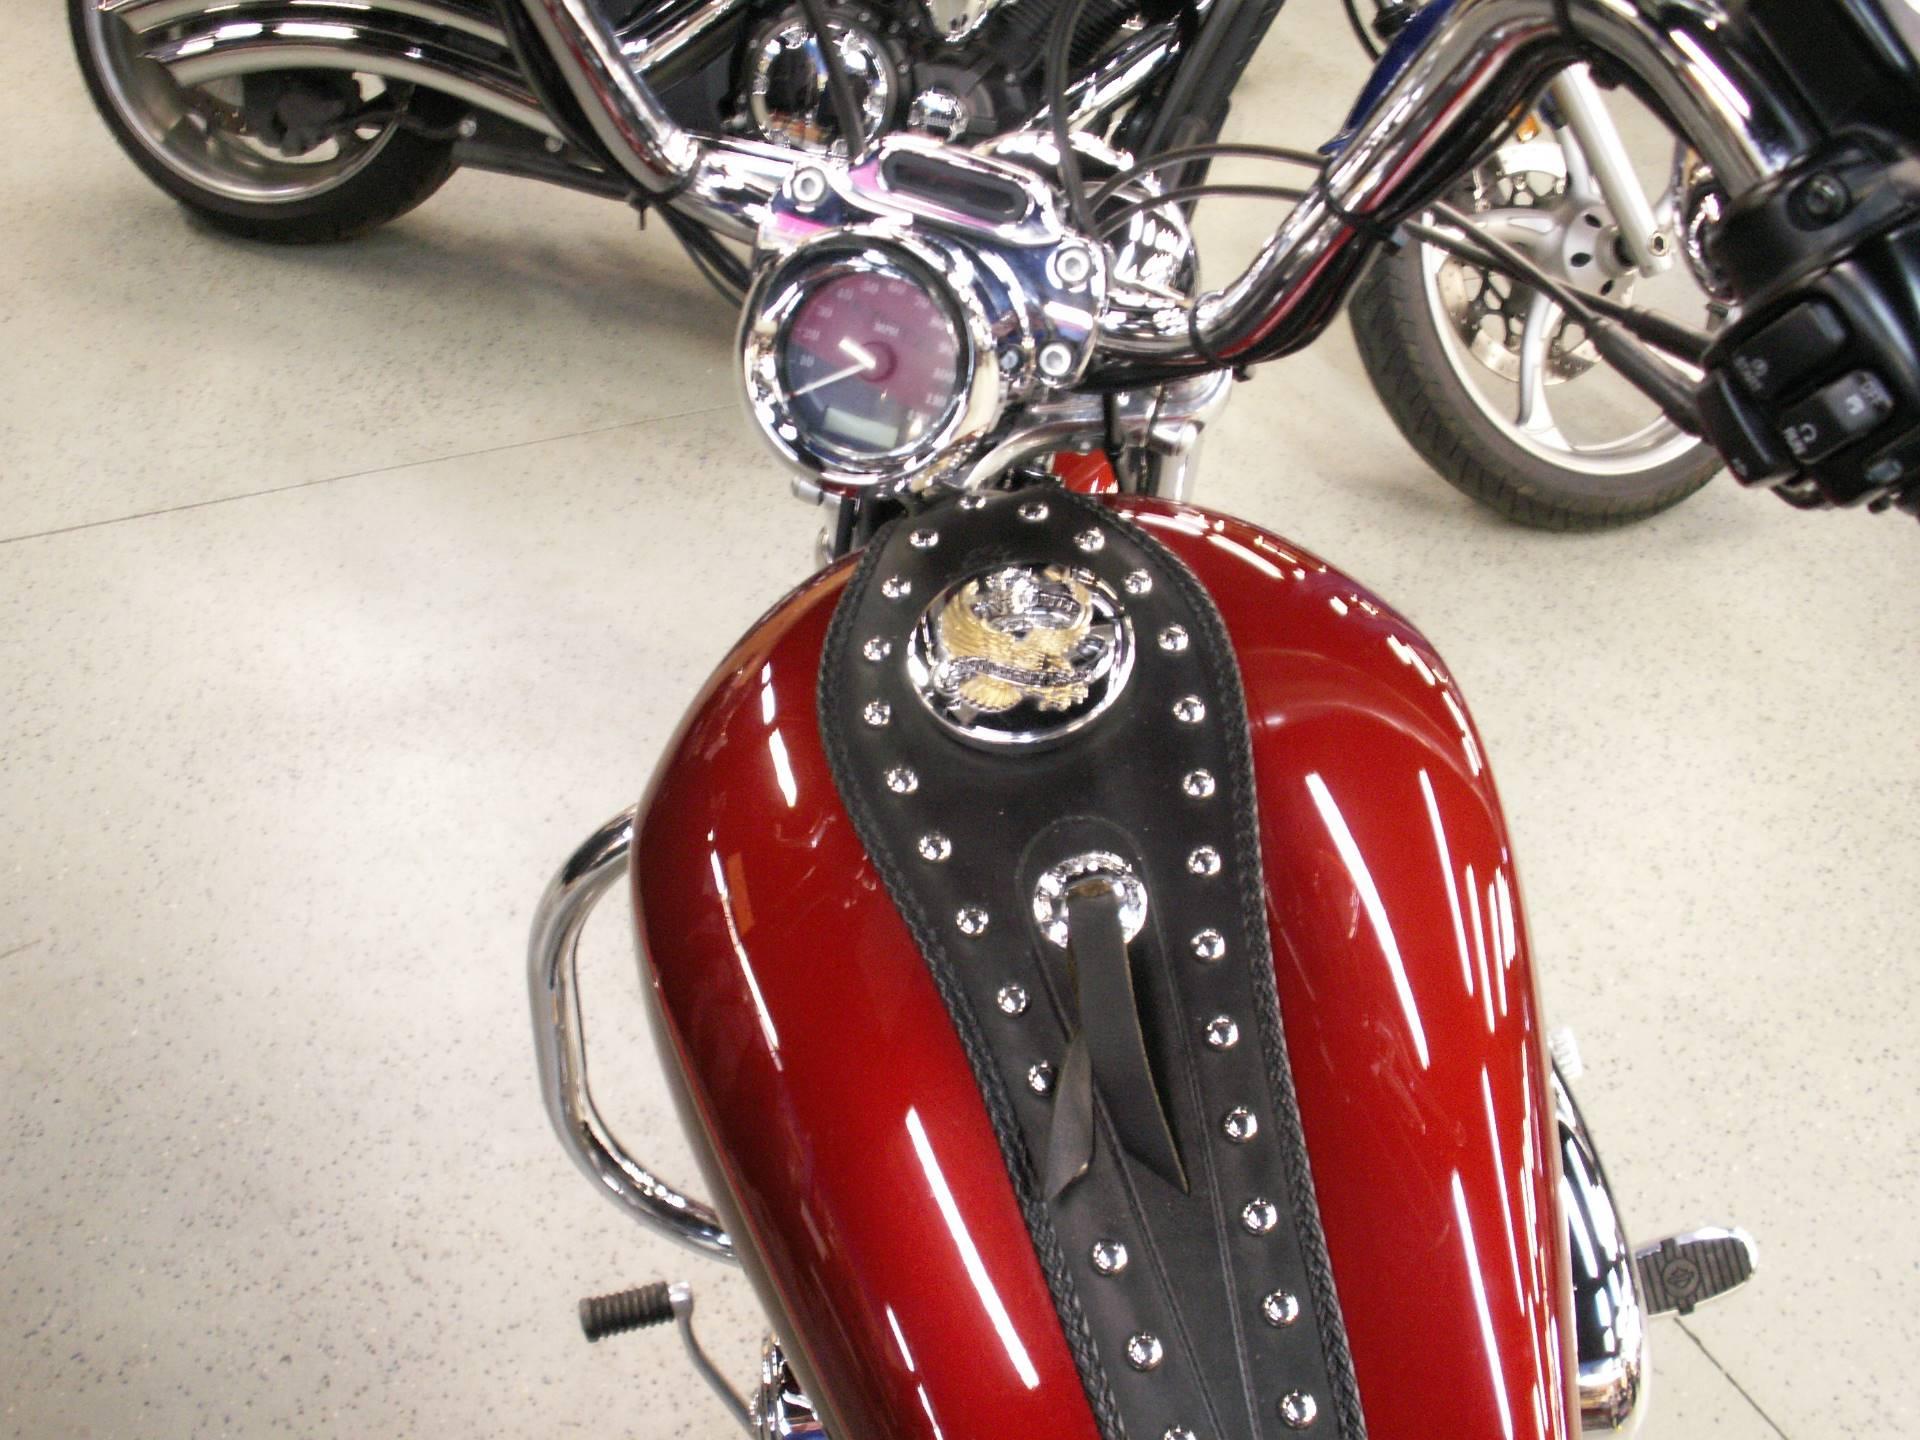 2009 Harley-Davidson Sportster 883 Custom 5